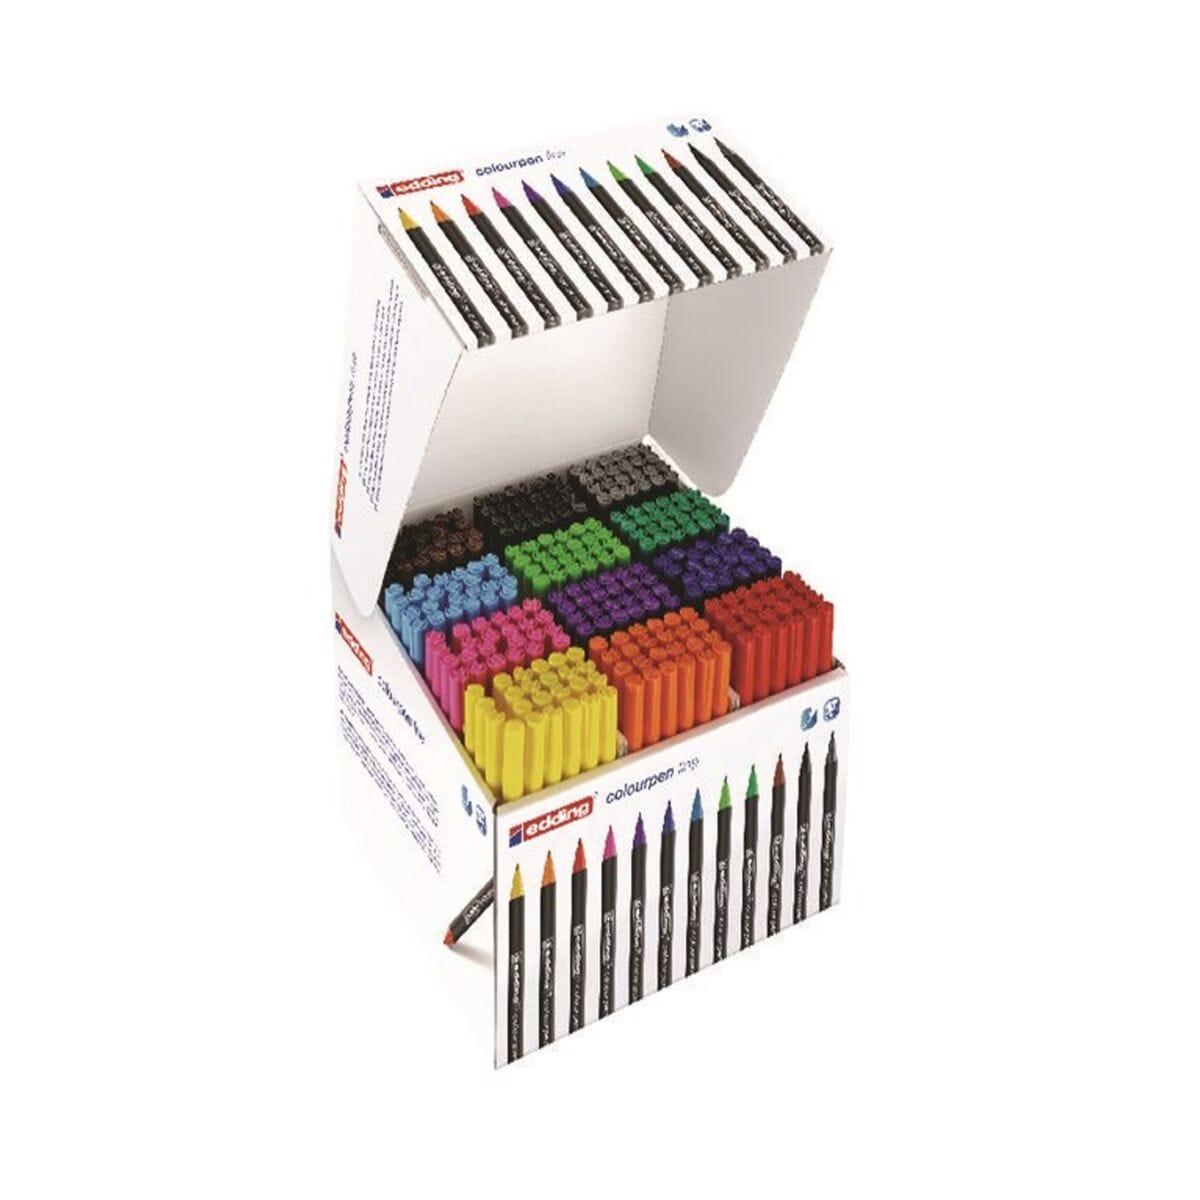 Edding Colourpen Fine Classpack of 288 Pens